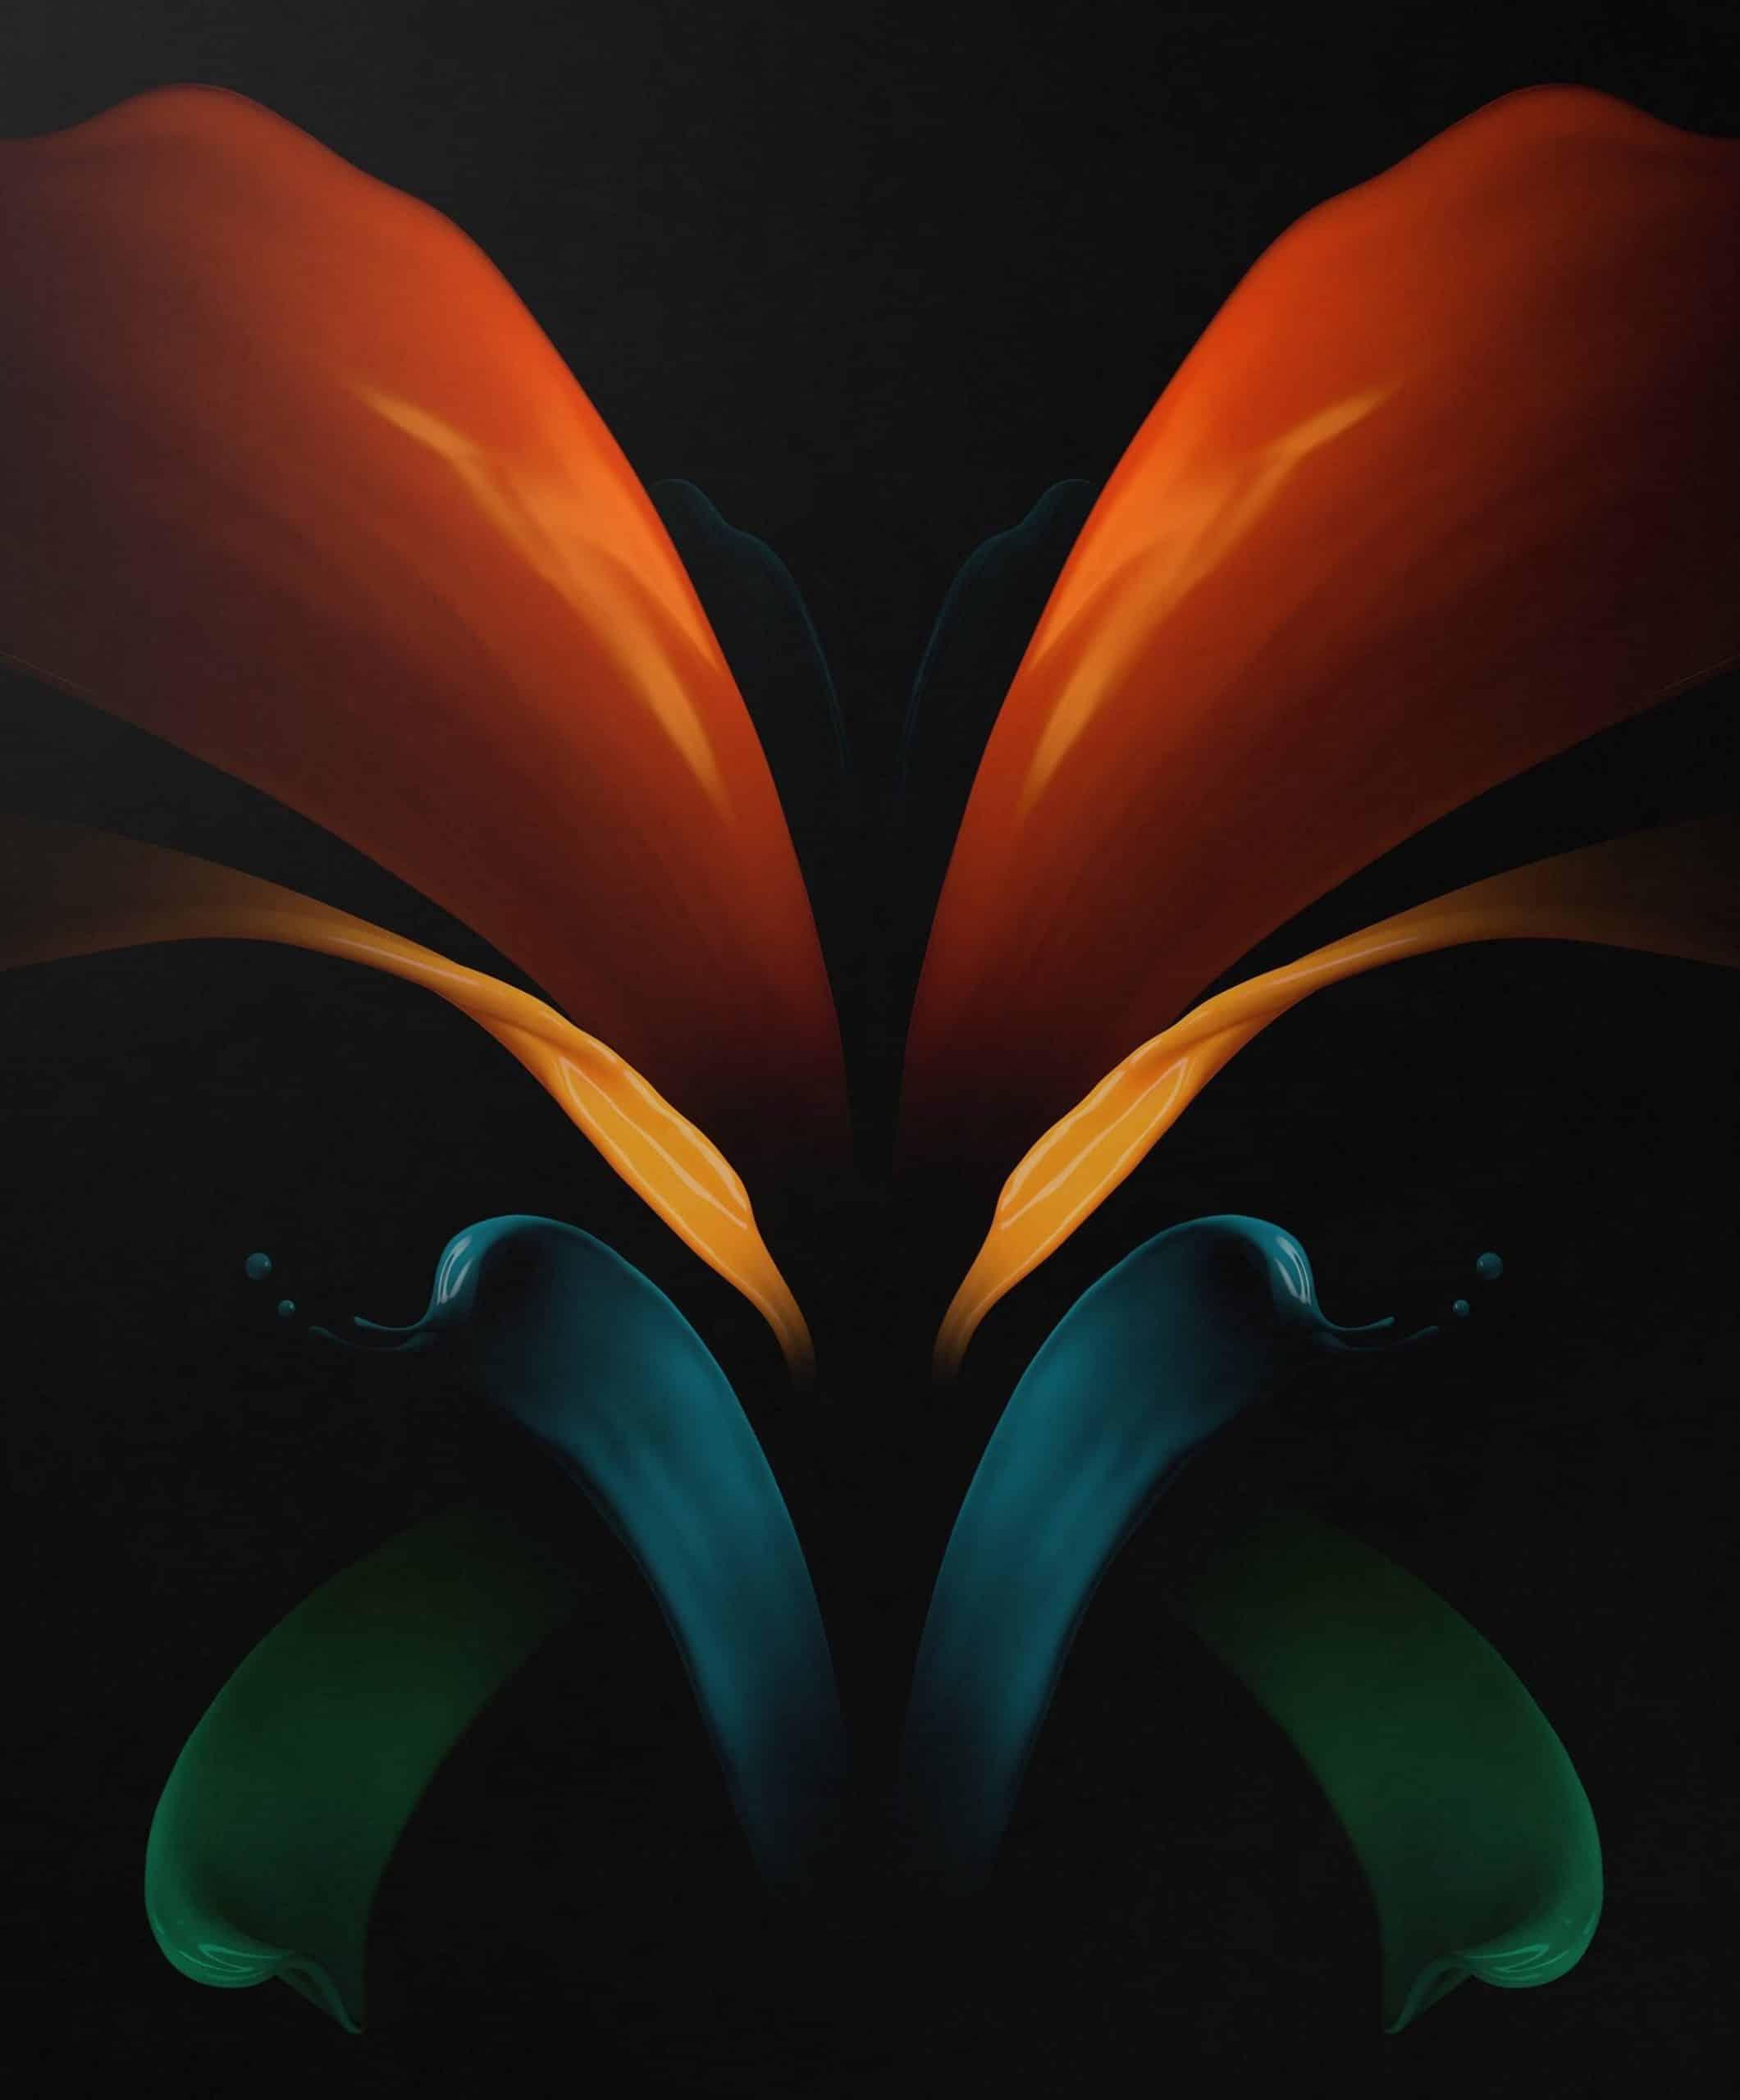 Galaxy Z Fold 2 wallpaper image 1